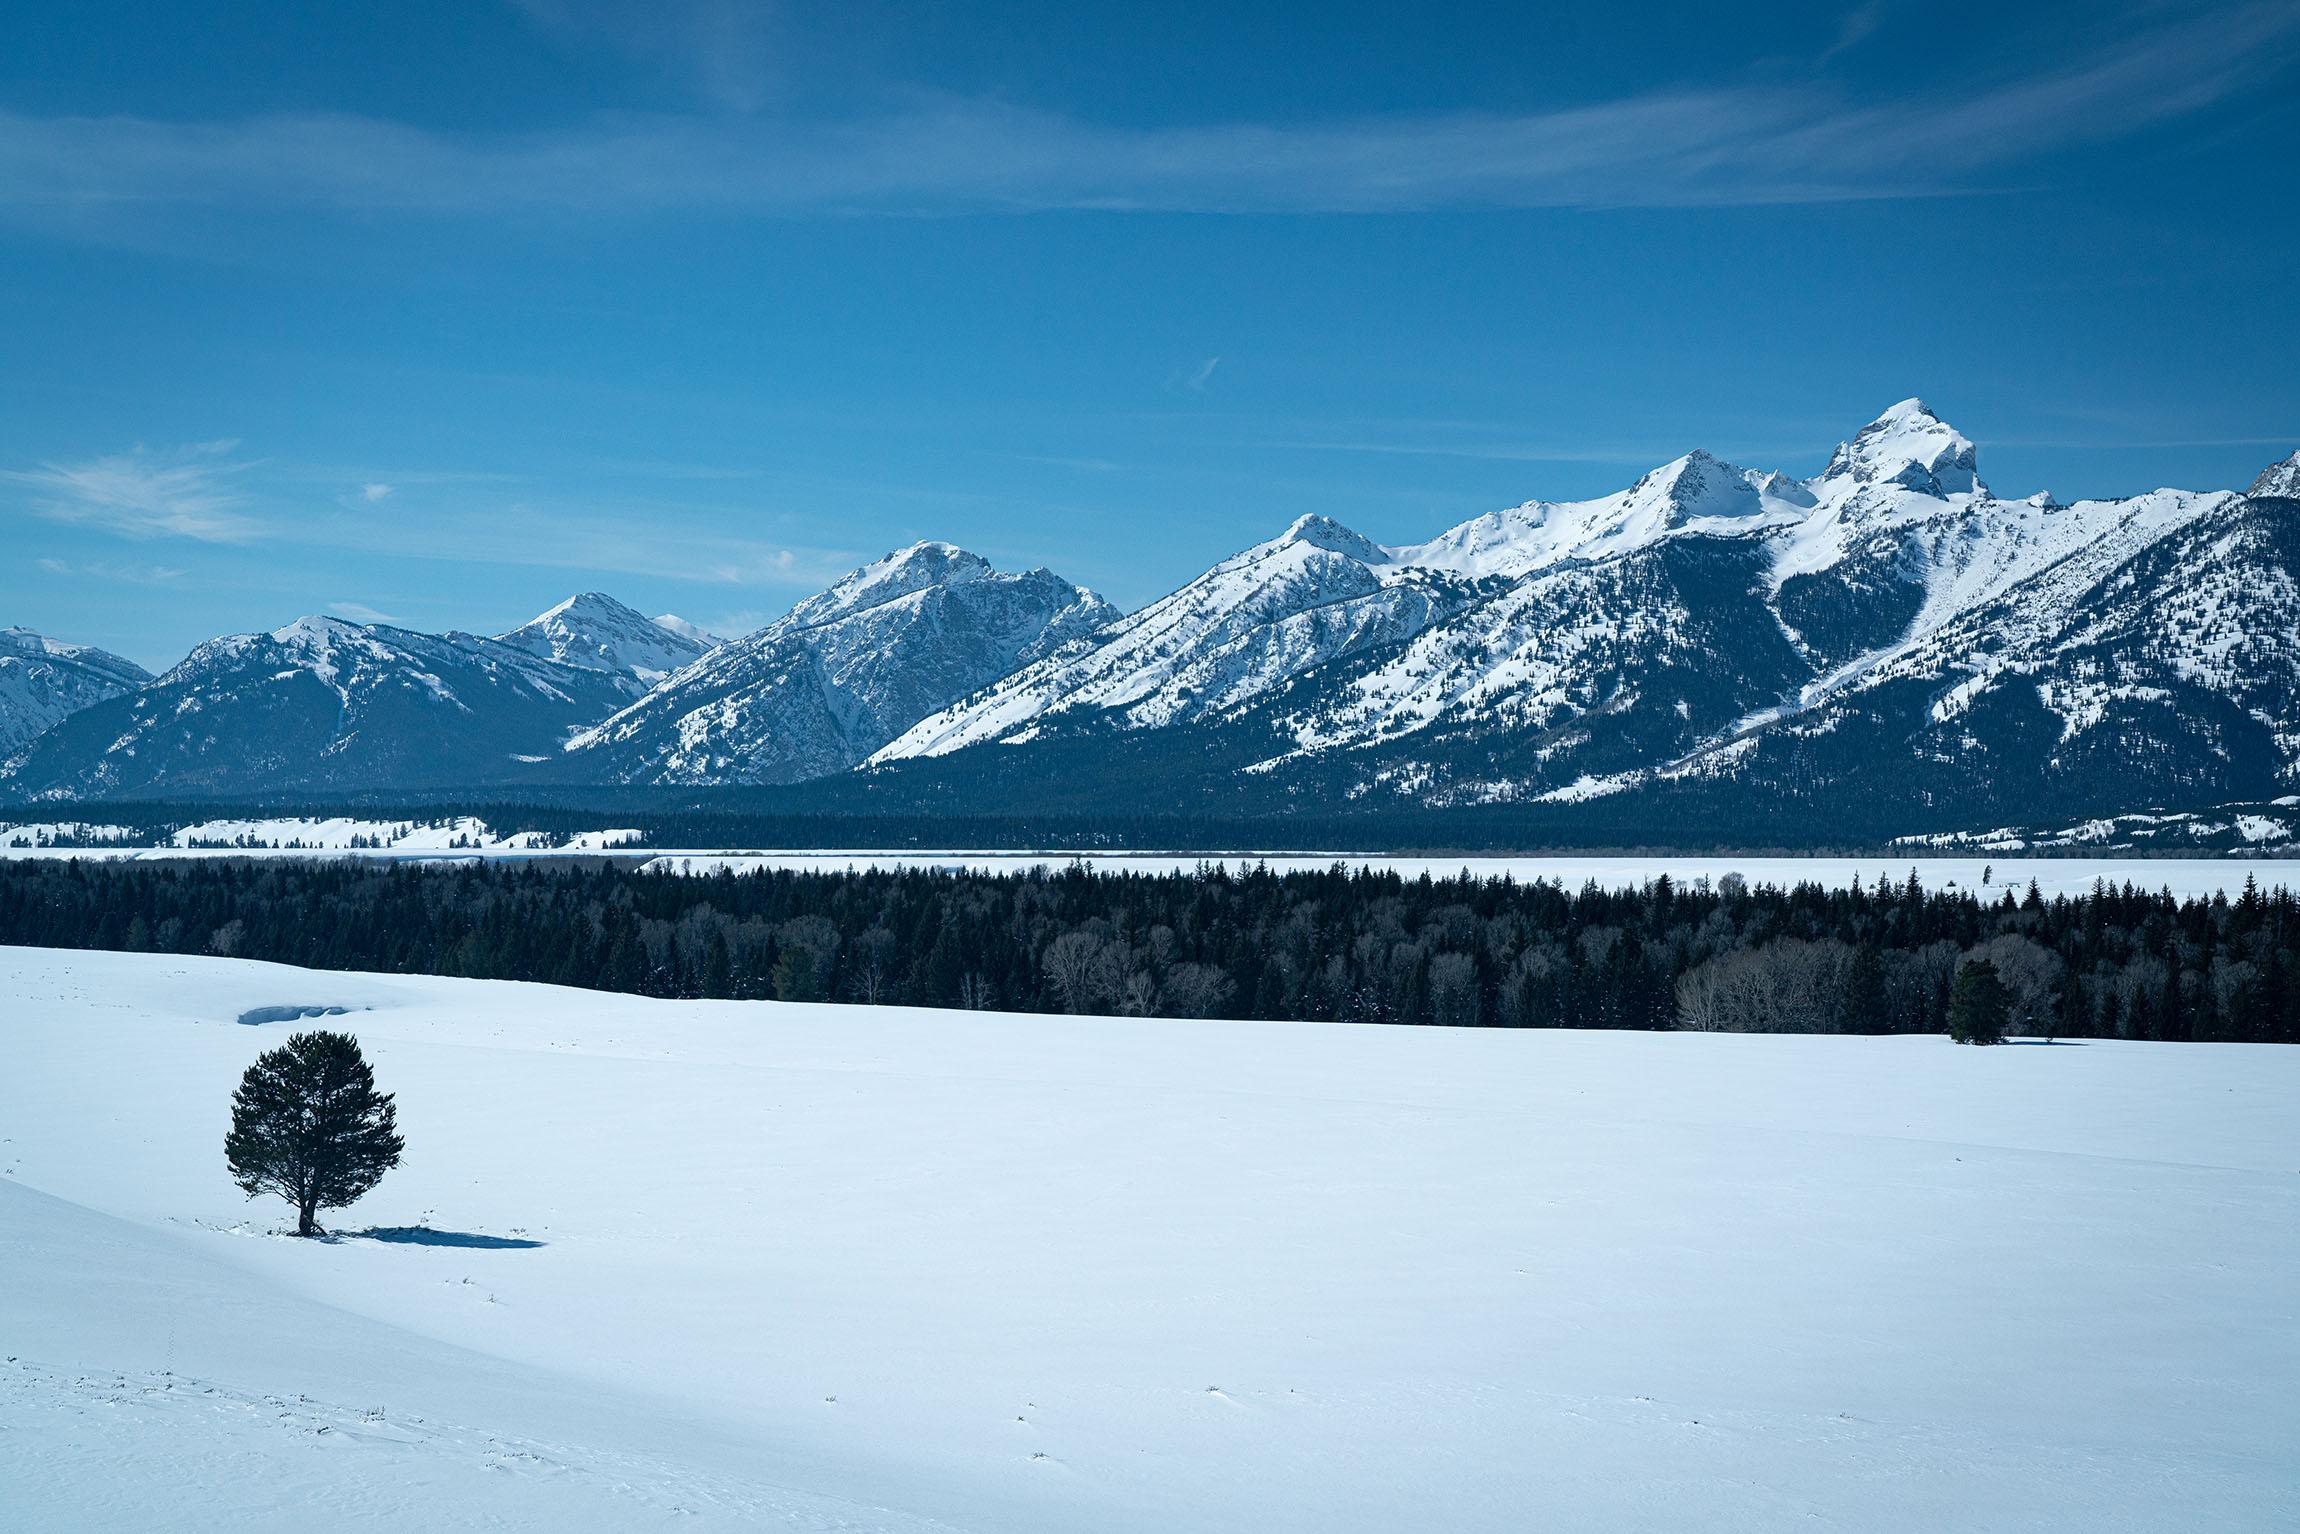 #grandtetonnationalpark, #grandtetons, #nationalpark, #lonetree, #snow, #winter, #mountains,